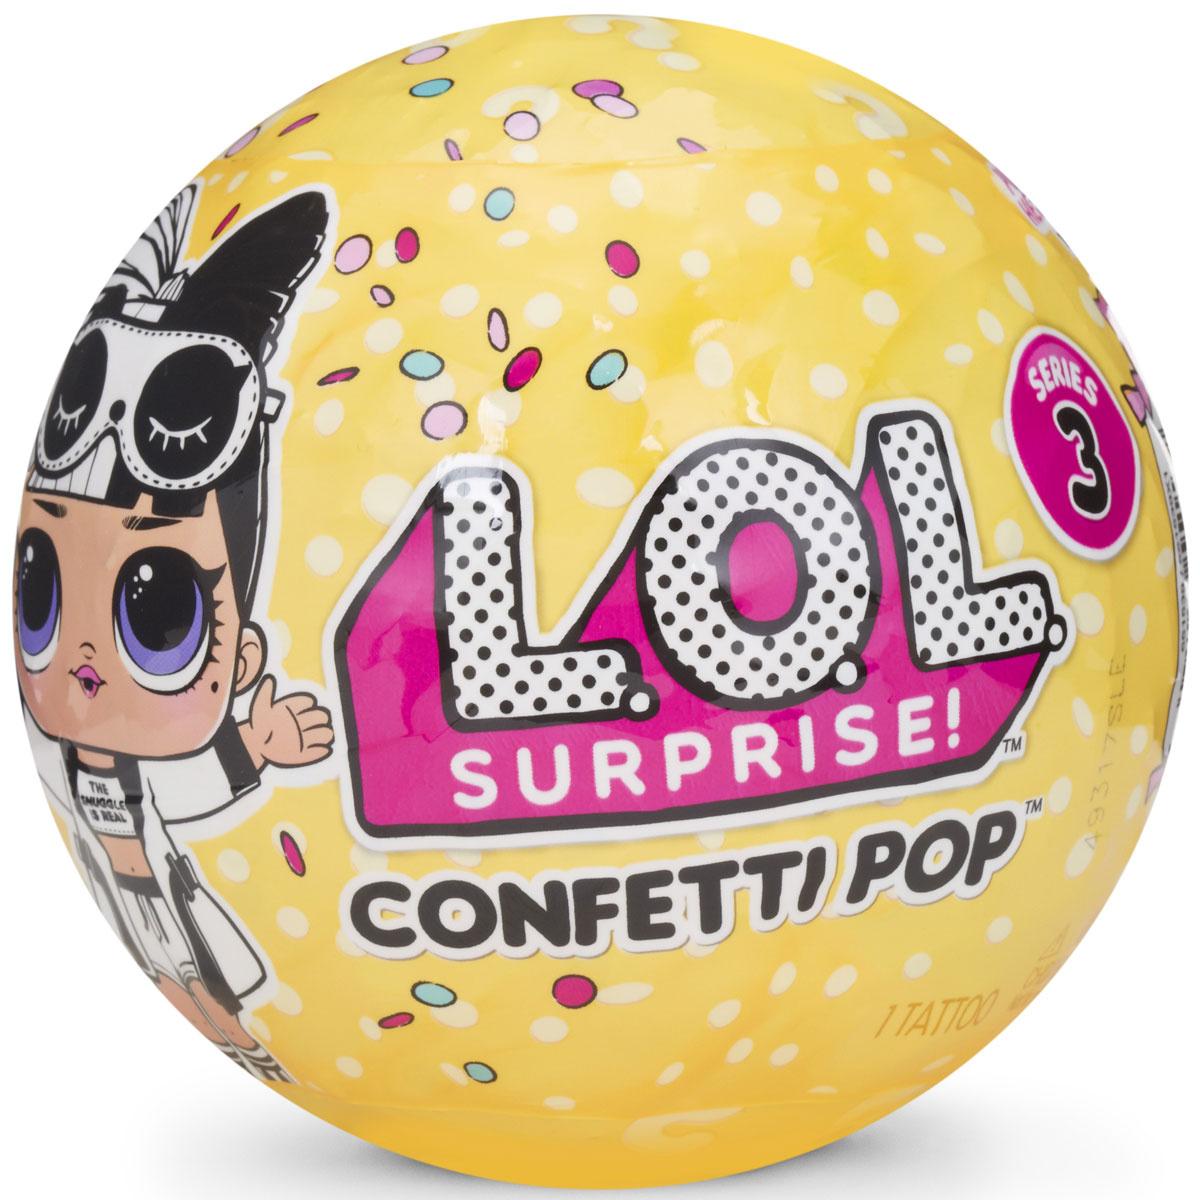 Кукла в шарике L.O.L. Surprise! Конфетти/Confetti Pop, 551515 #1